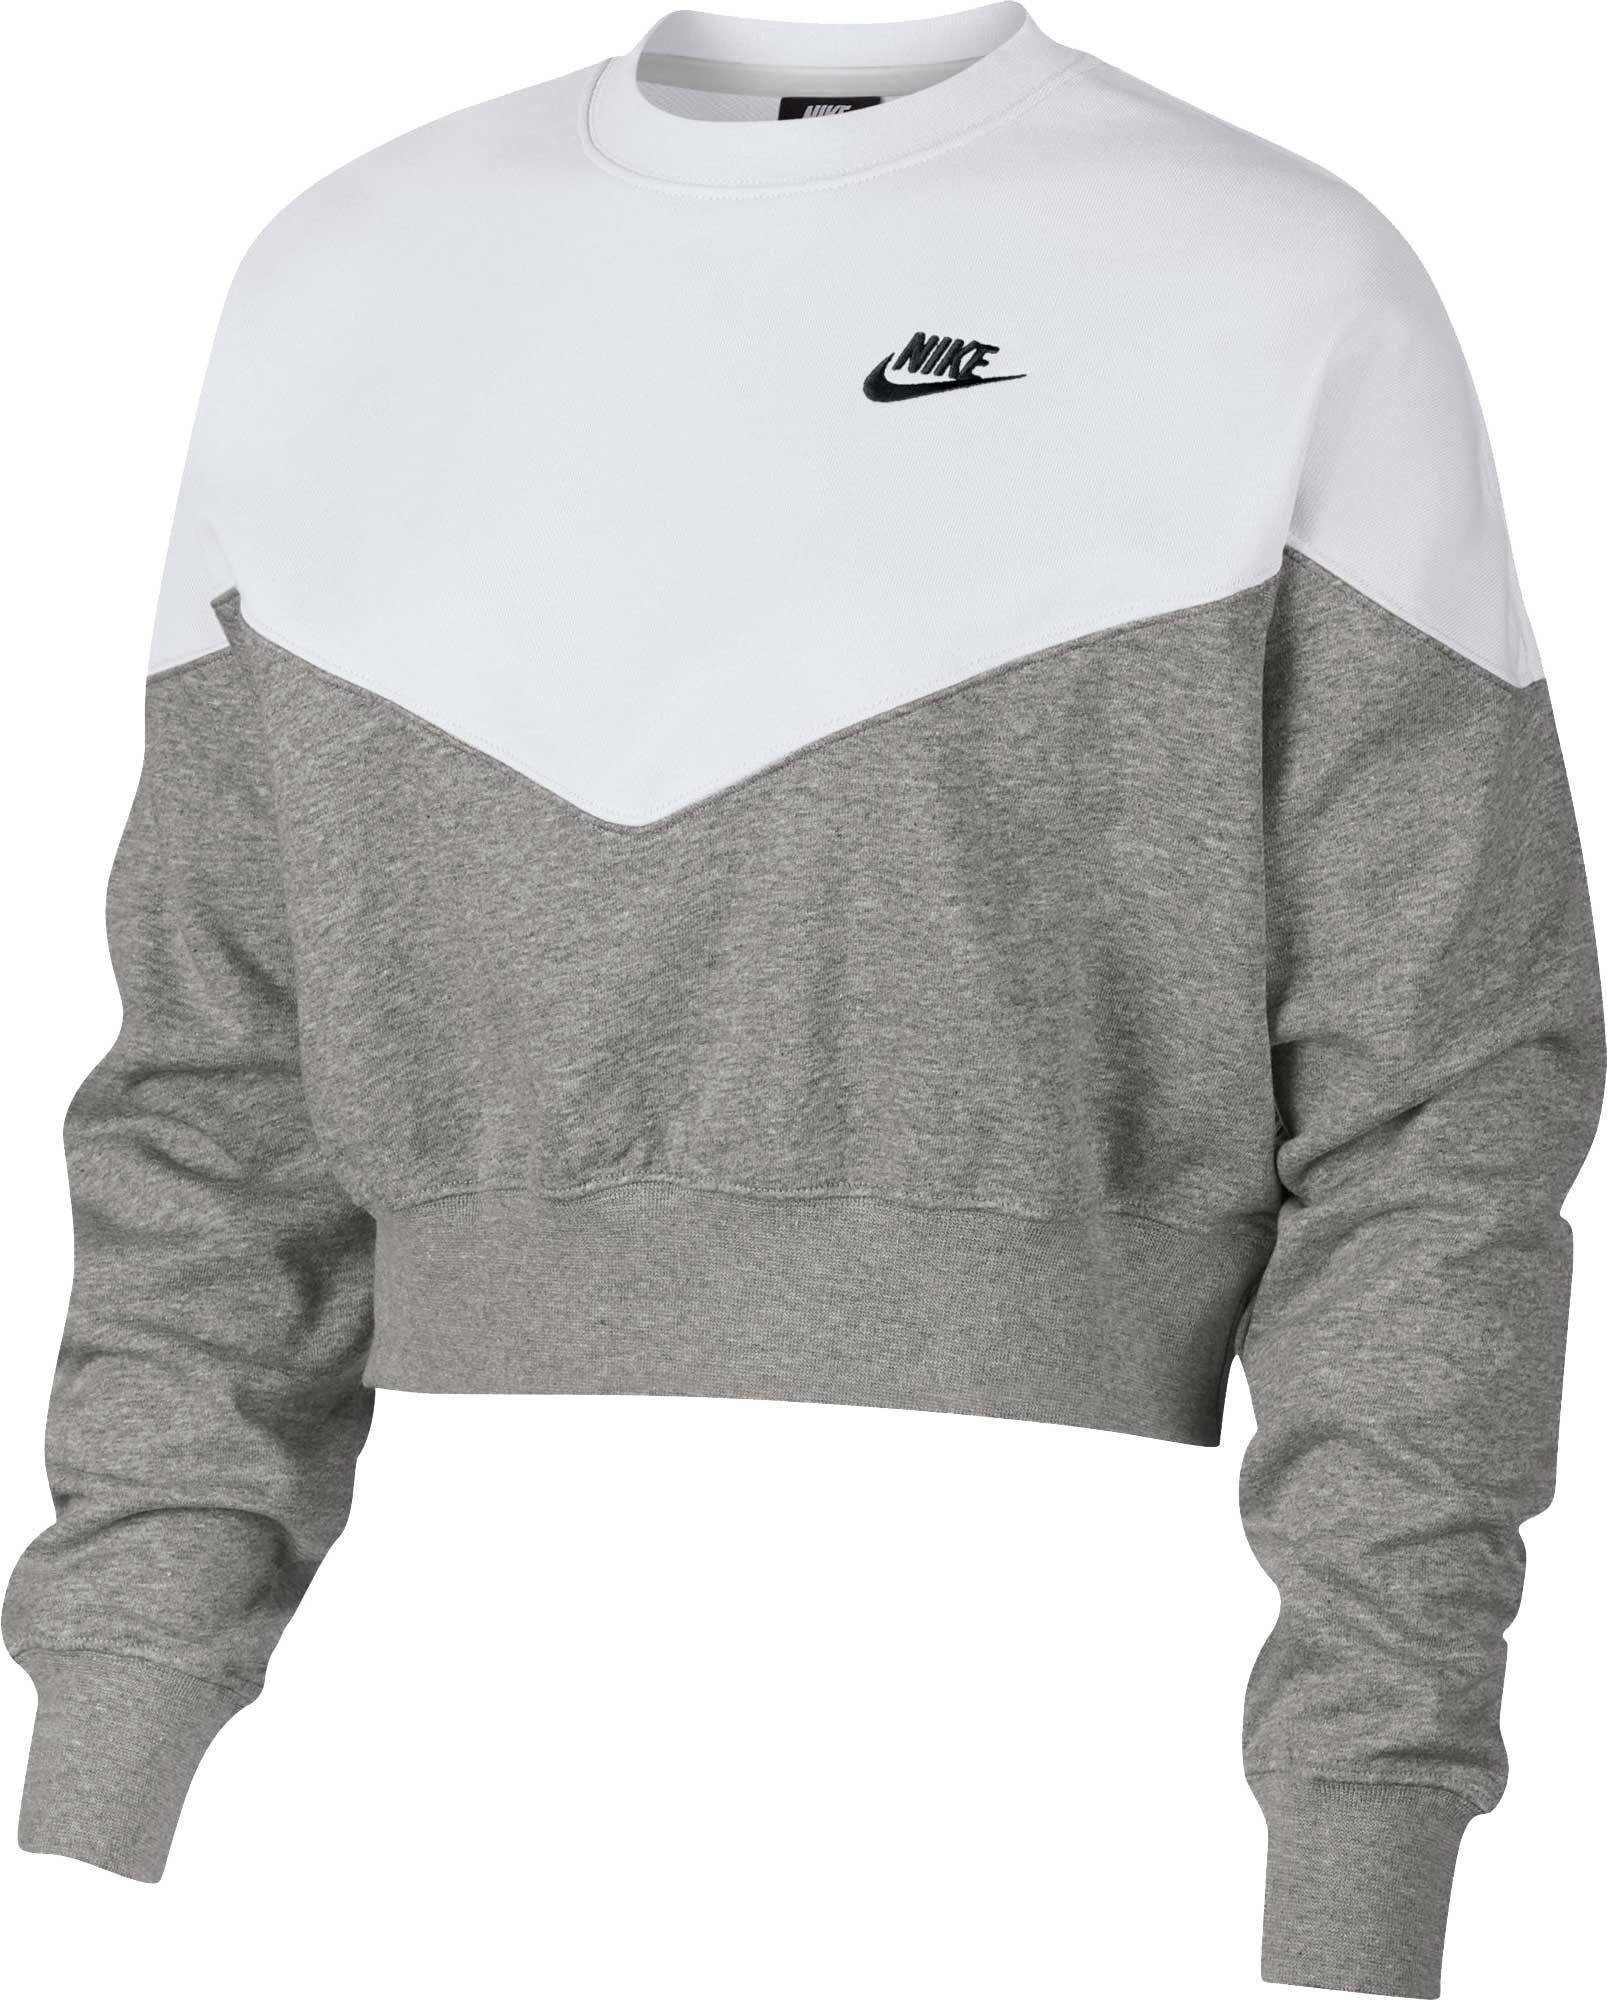 Nike Women S Sportswear Heritage Crew Pullover Roupas Nike Roupas Adidas Moletons Femininos [ 2000 x 1607 Pixel ]